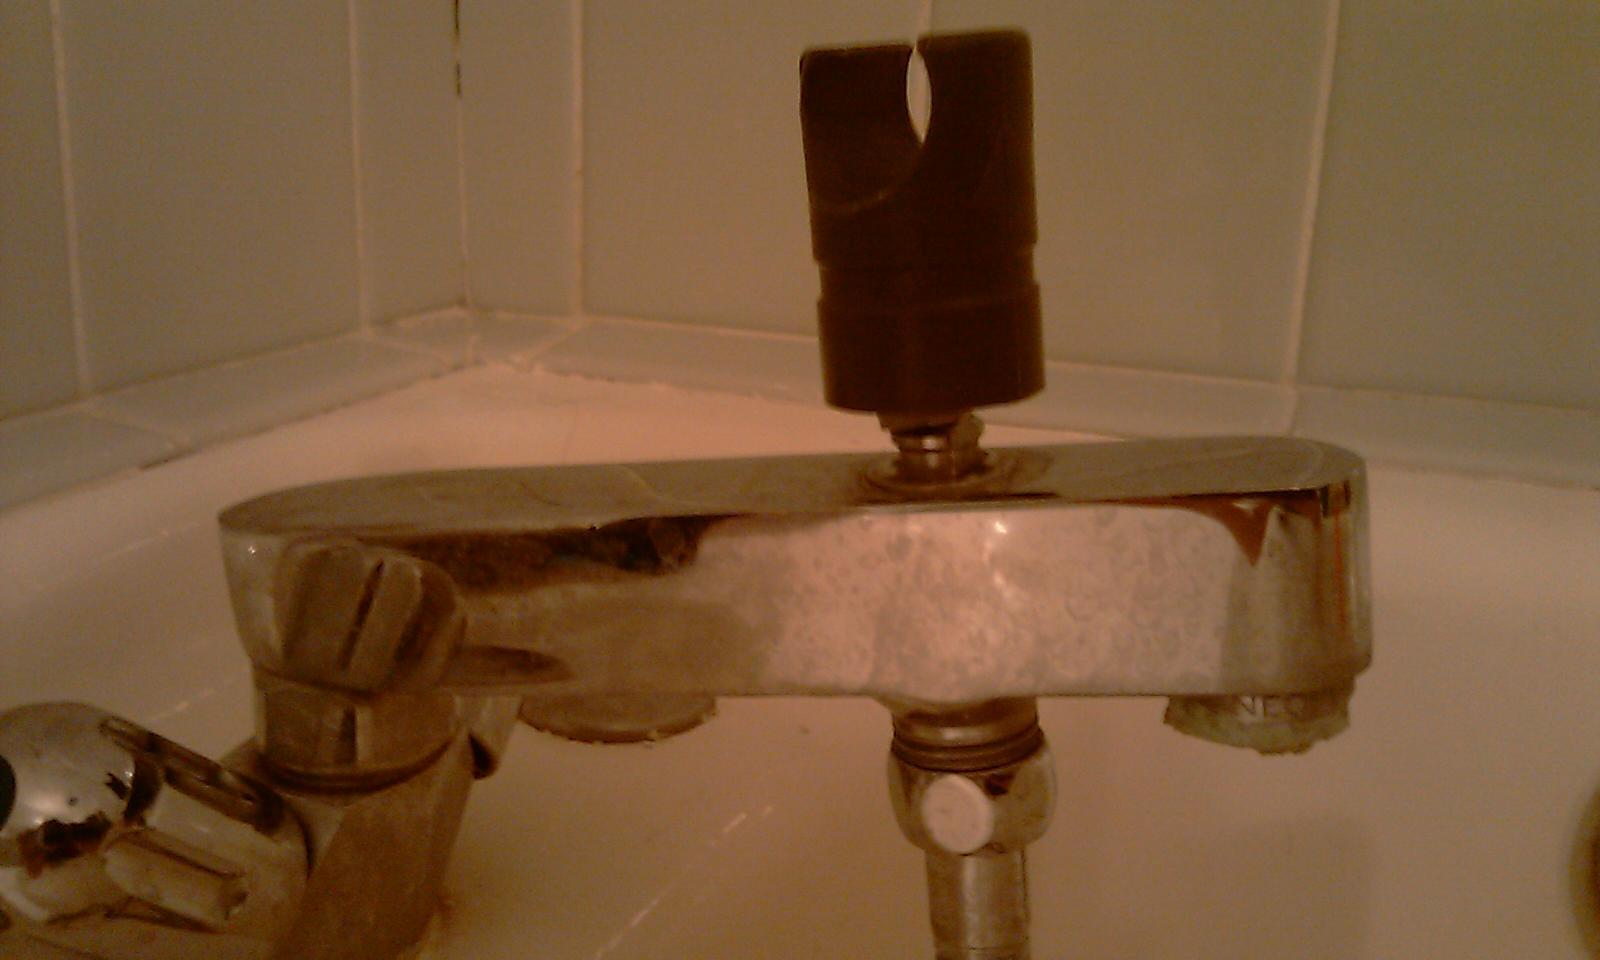 demonter un ancien robinet melangeur bain douche. Black Bedroom Furniture Sets. Home Design Ideas